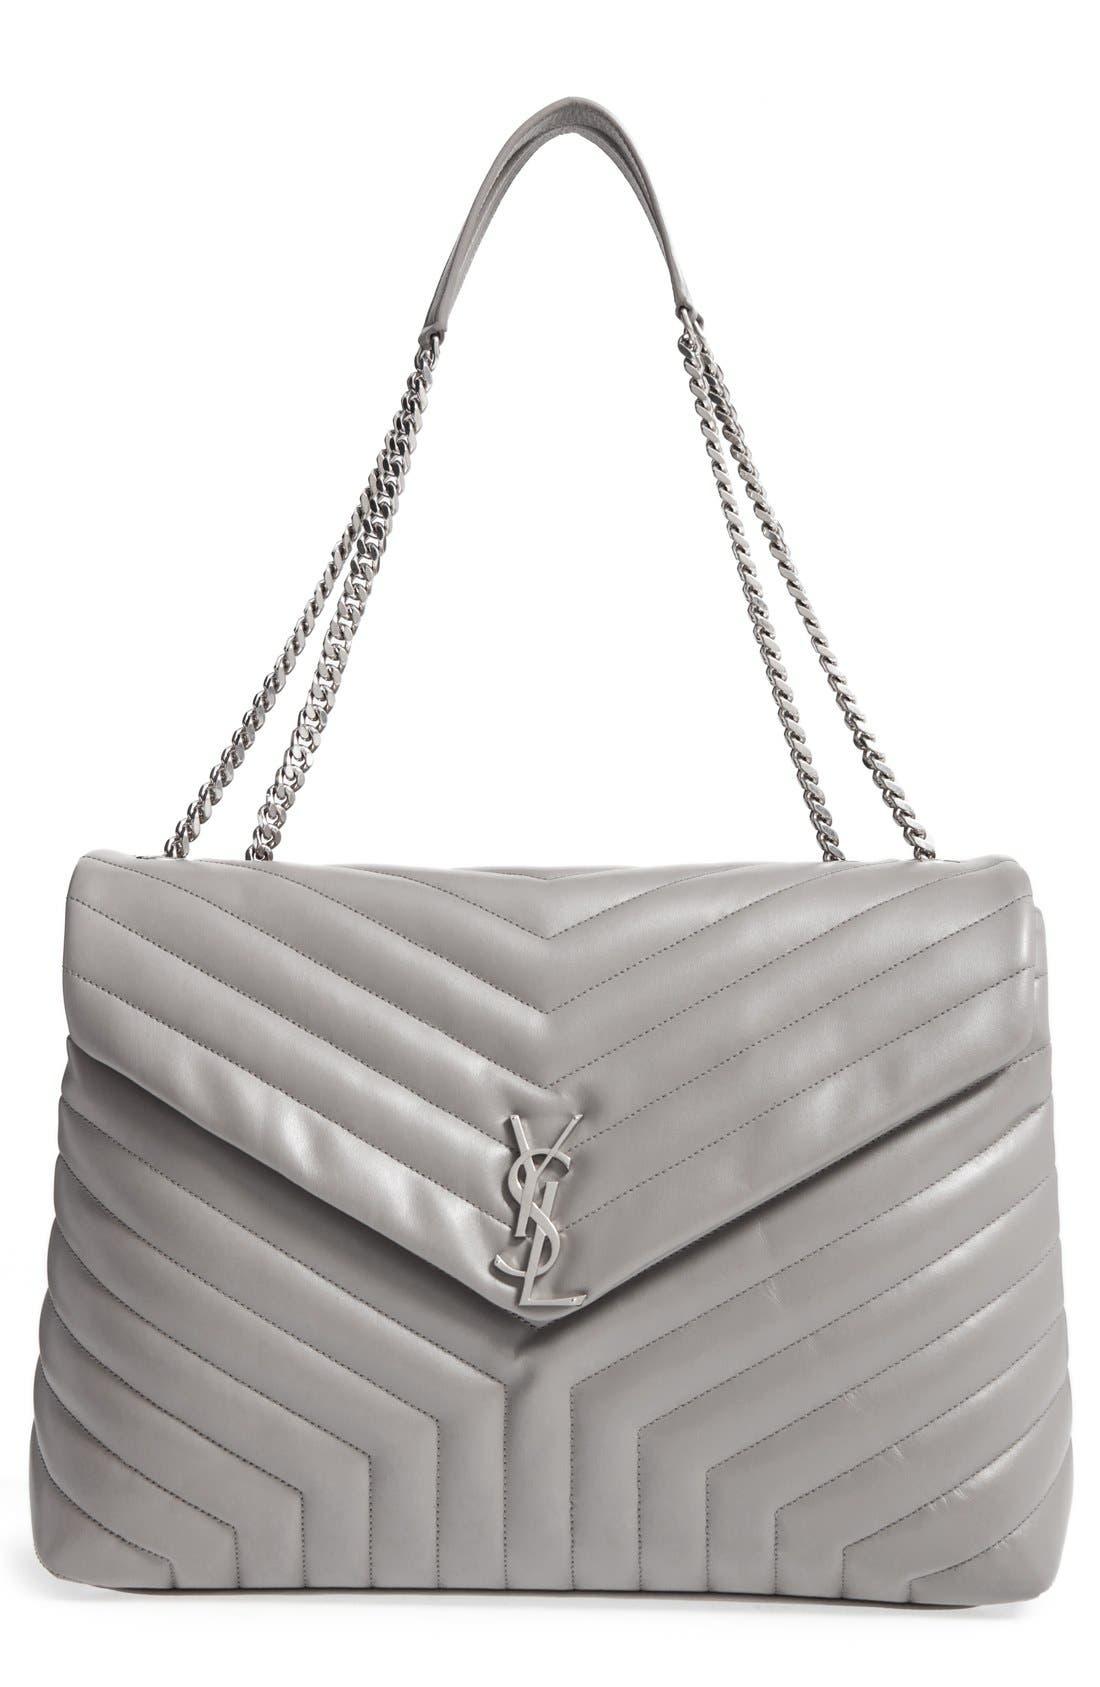 Alternate Image 1 Selected - Saint Laurent Monogram Quilted Leather Slouchy Shoulder Bag